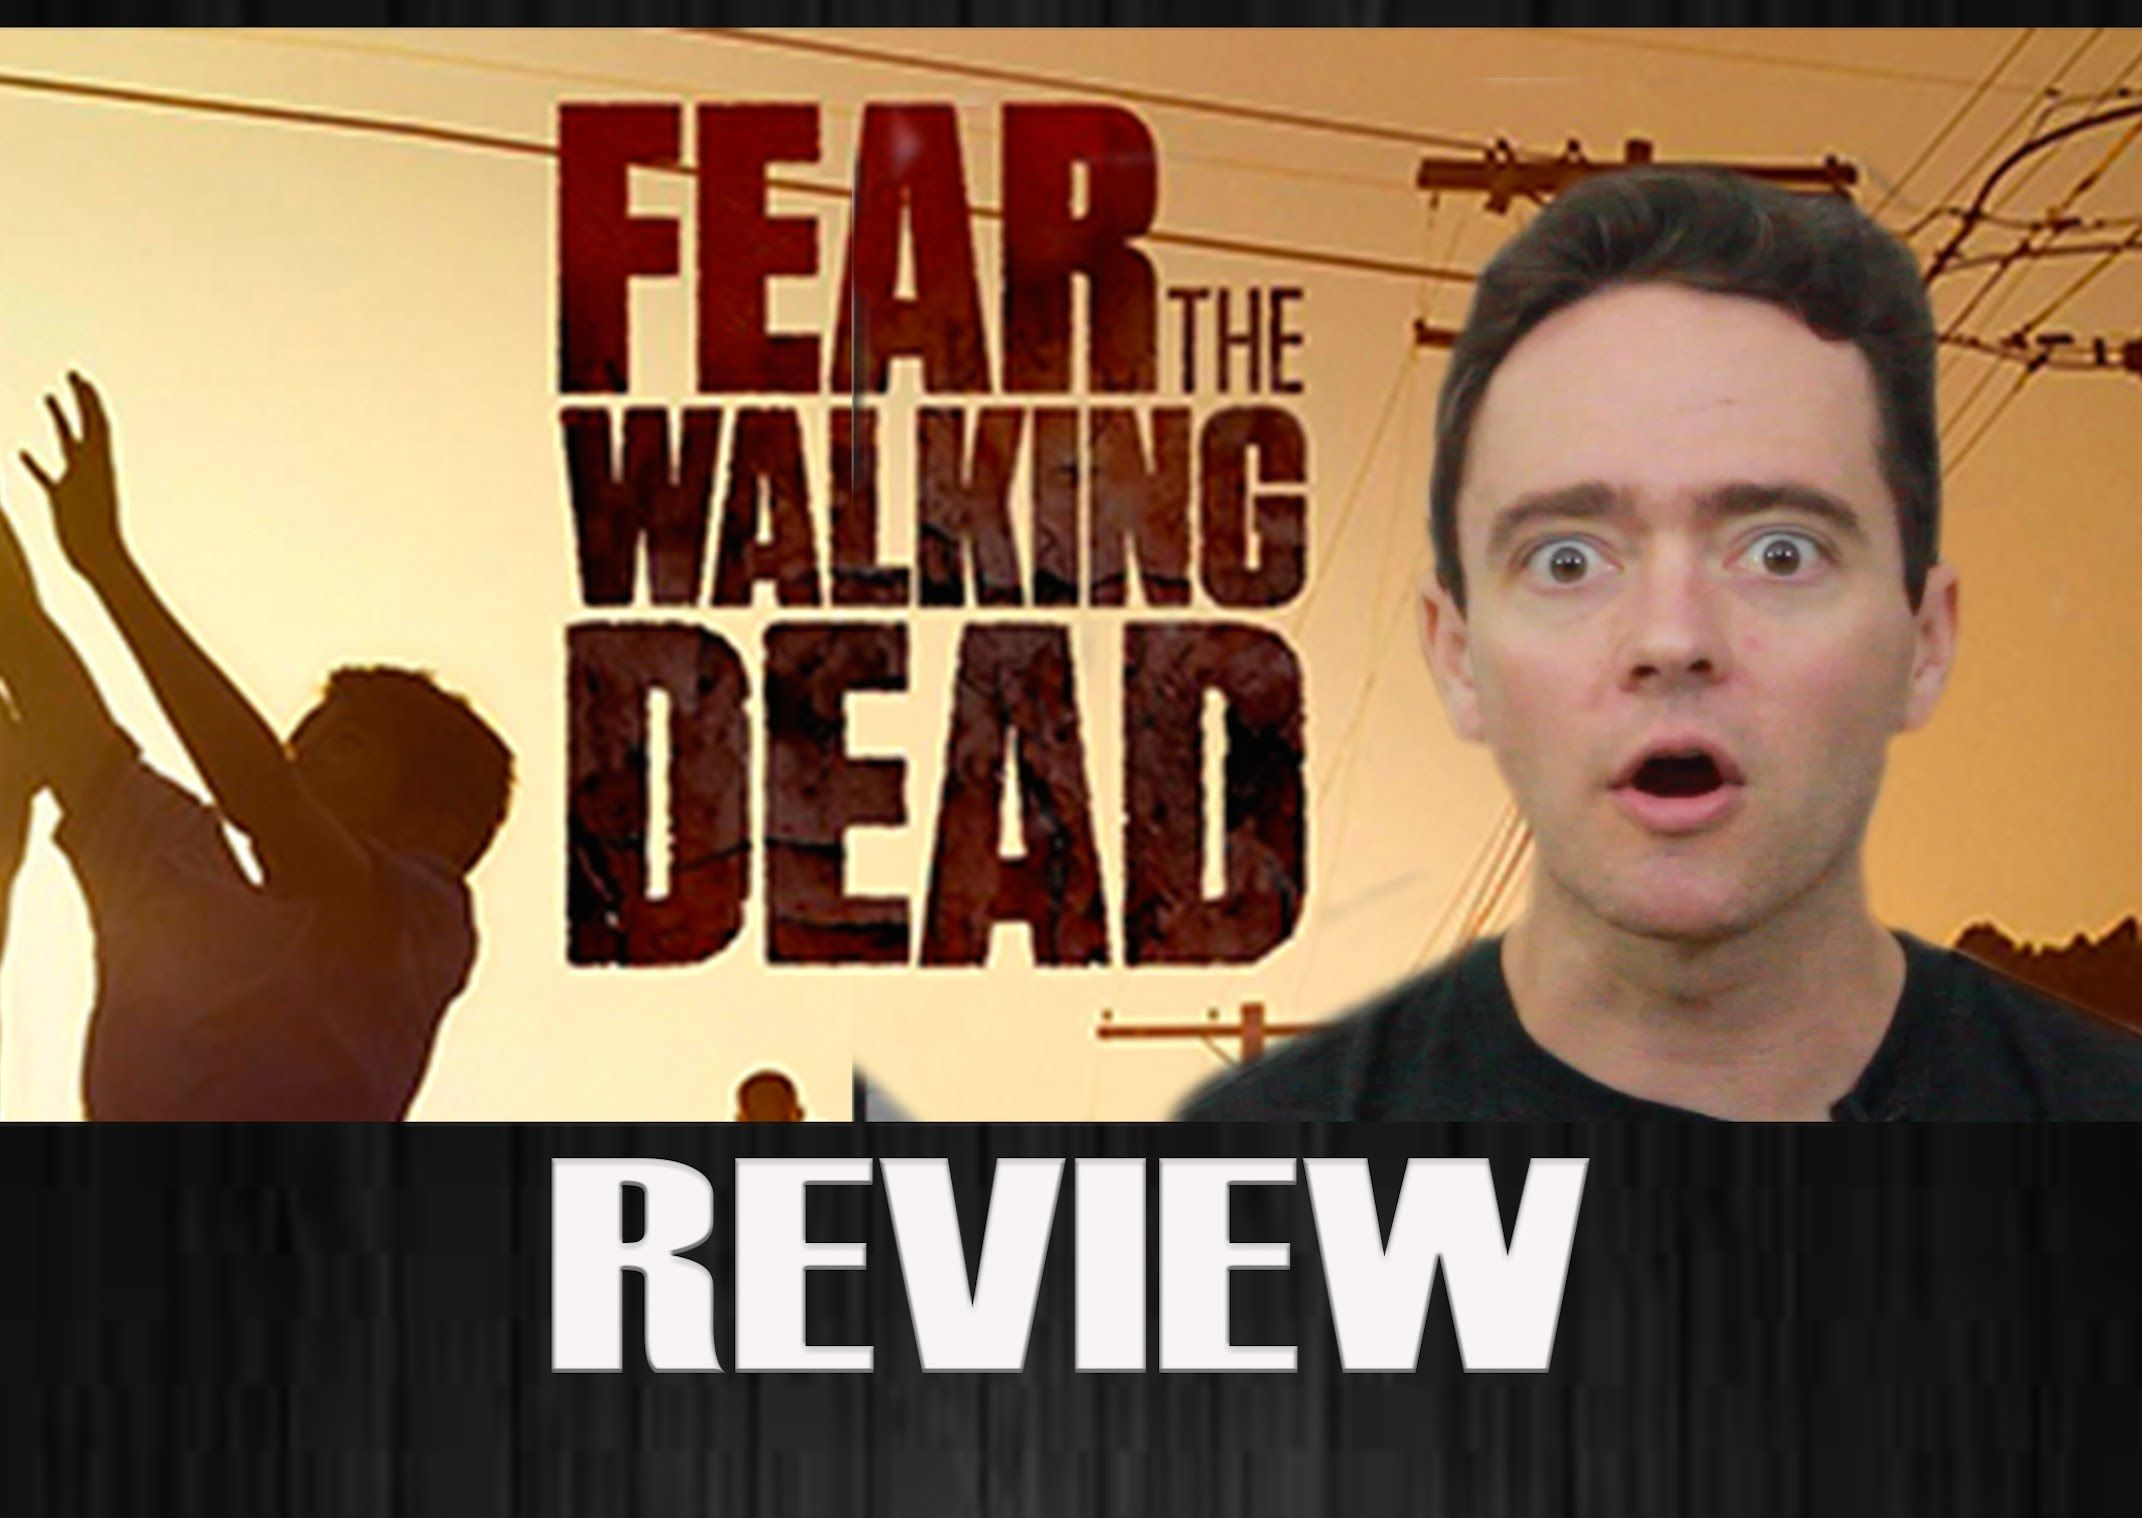 Fear the walking dead series premiere review fear the